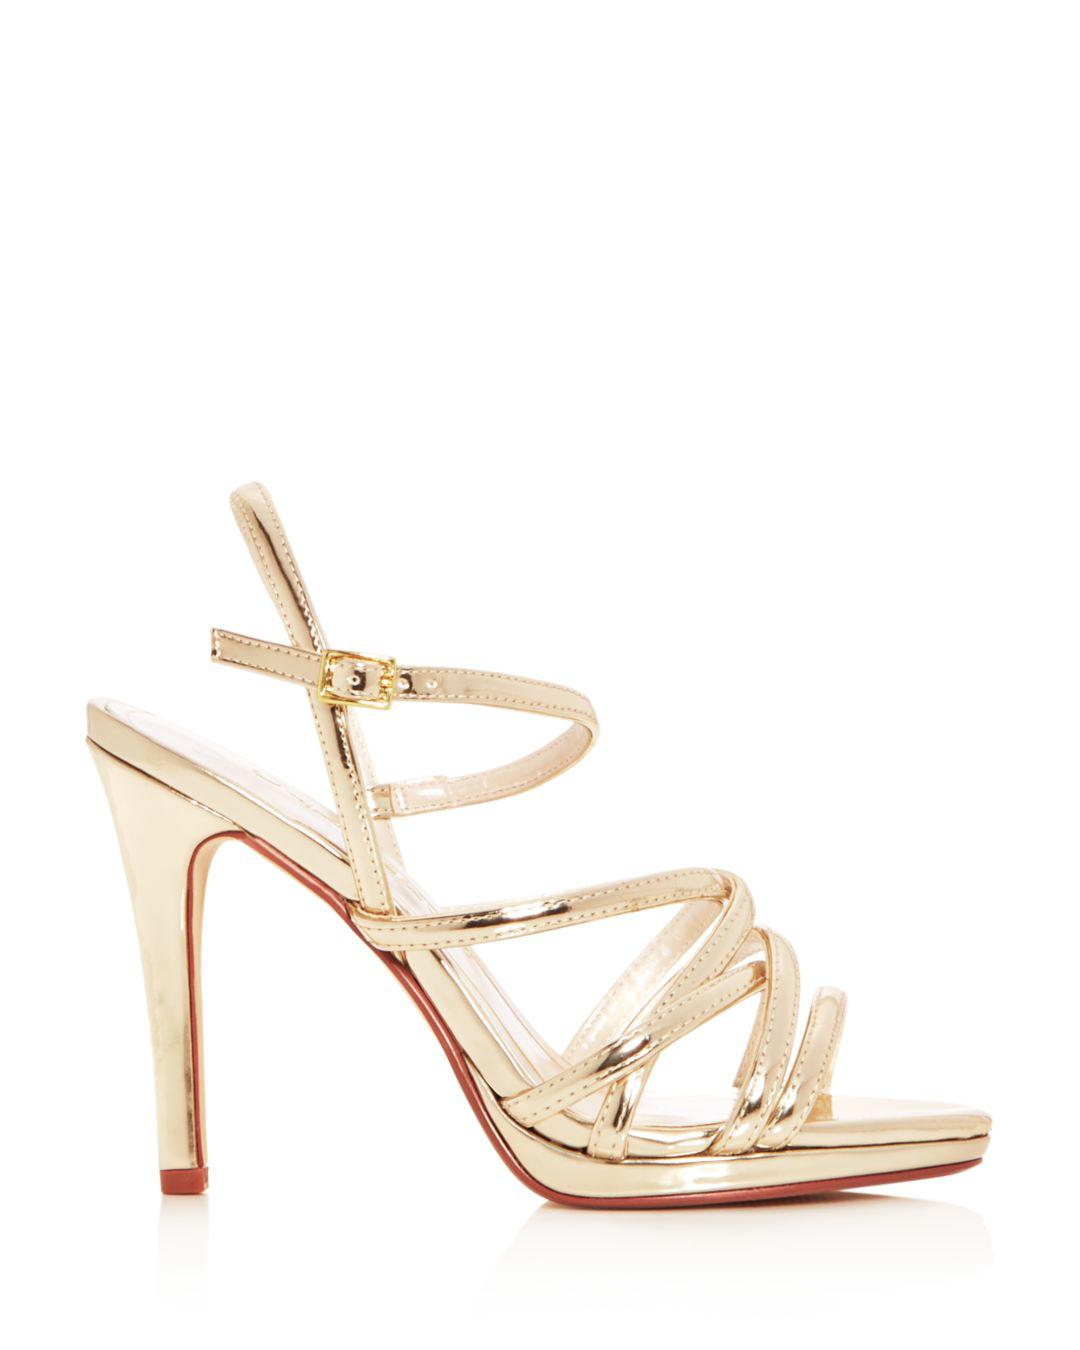 a9fd8c60d6ed Lyst - Caparros Women s Lola Strappy Slingback High-heel Platform ...